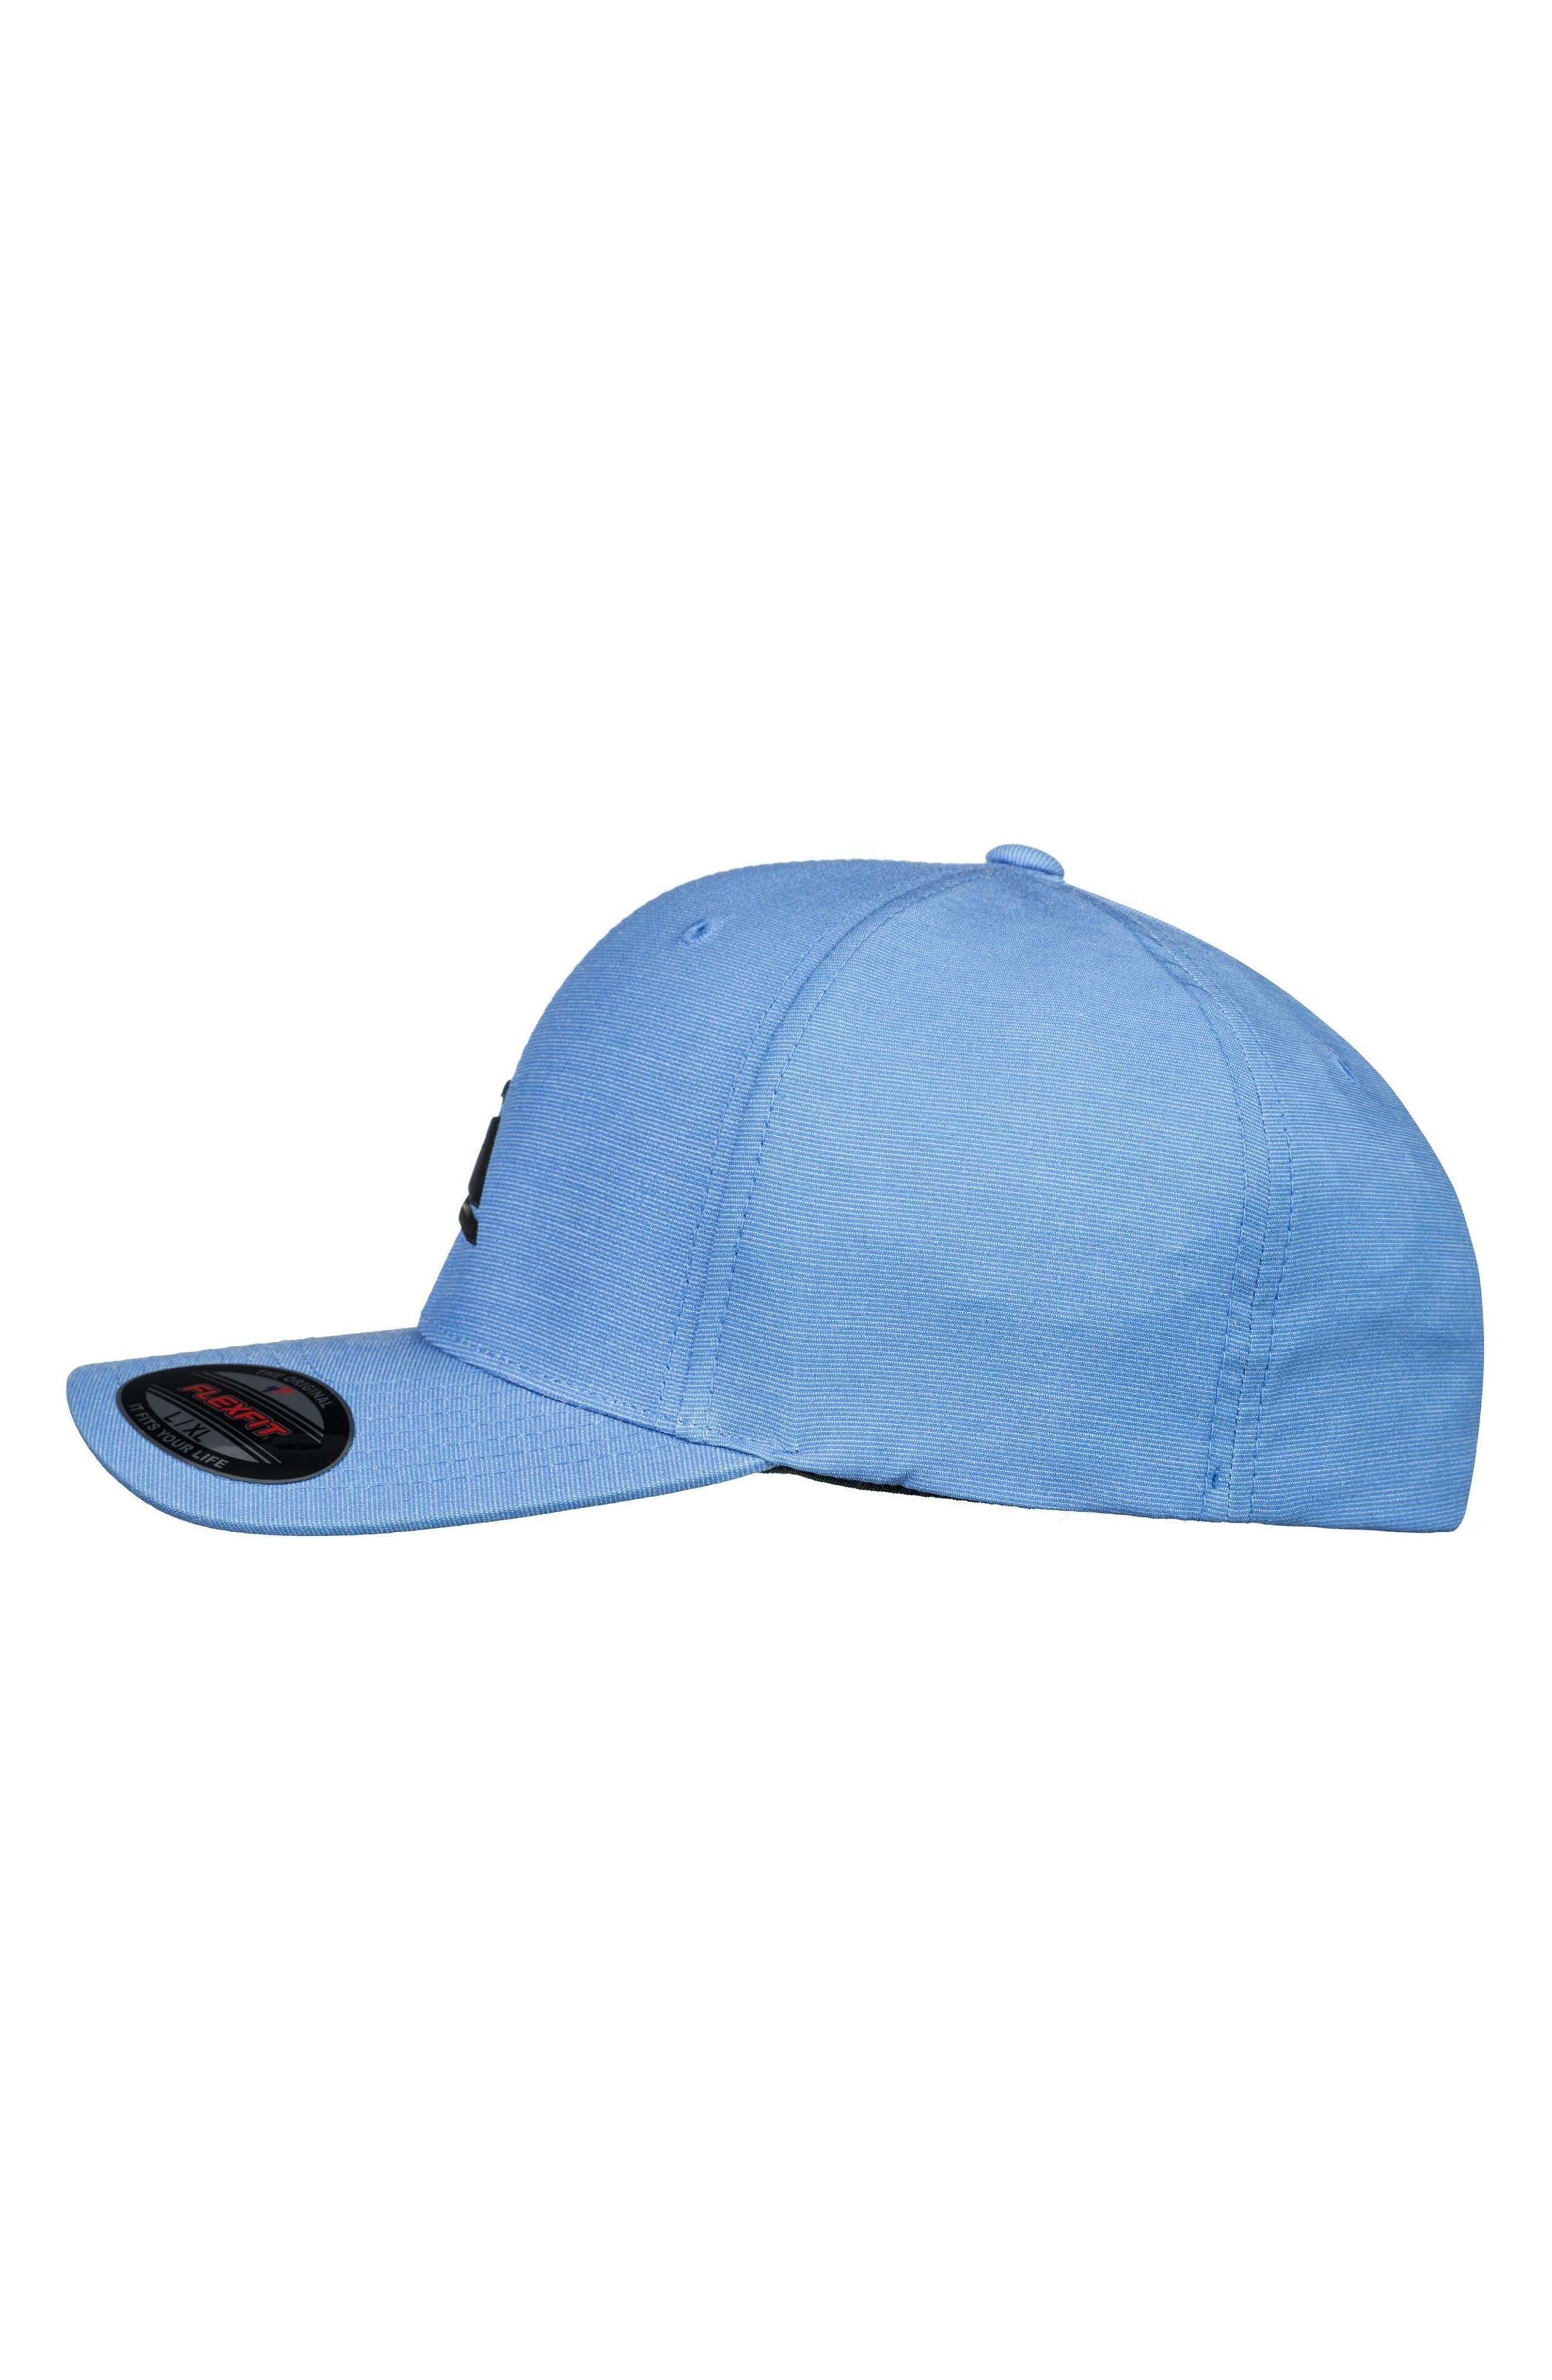 Texturizer Flexfit Ball Cap,                             Alternate thumbnail 3, color,                             Silver Lake Blue